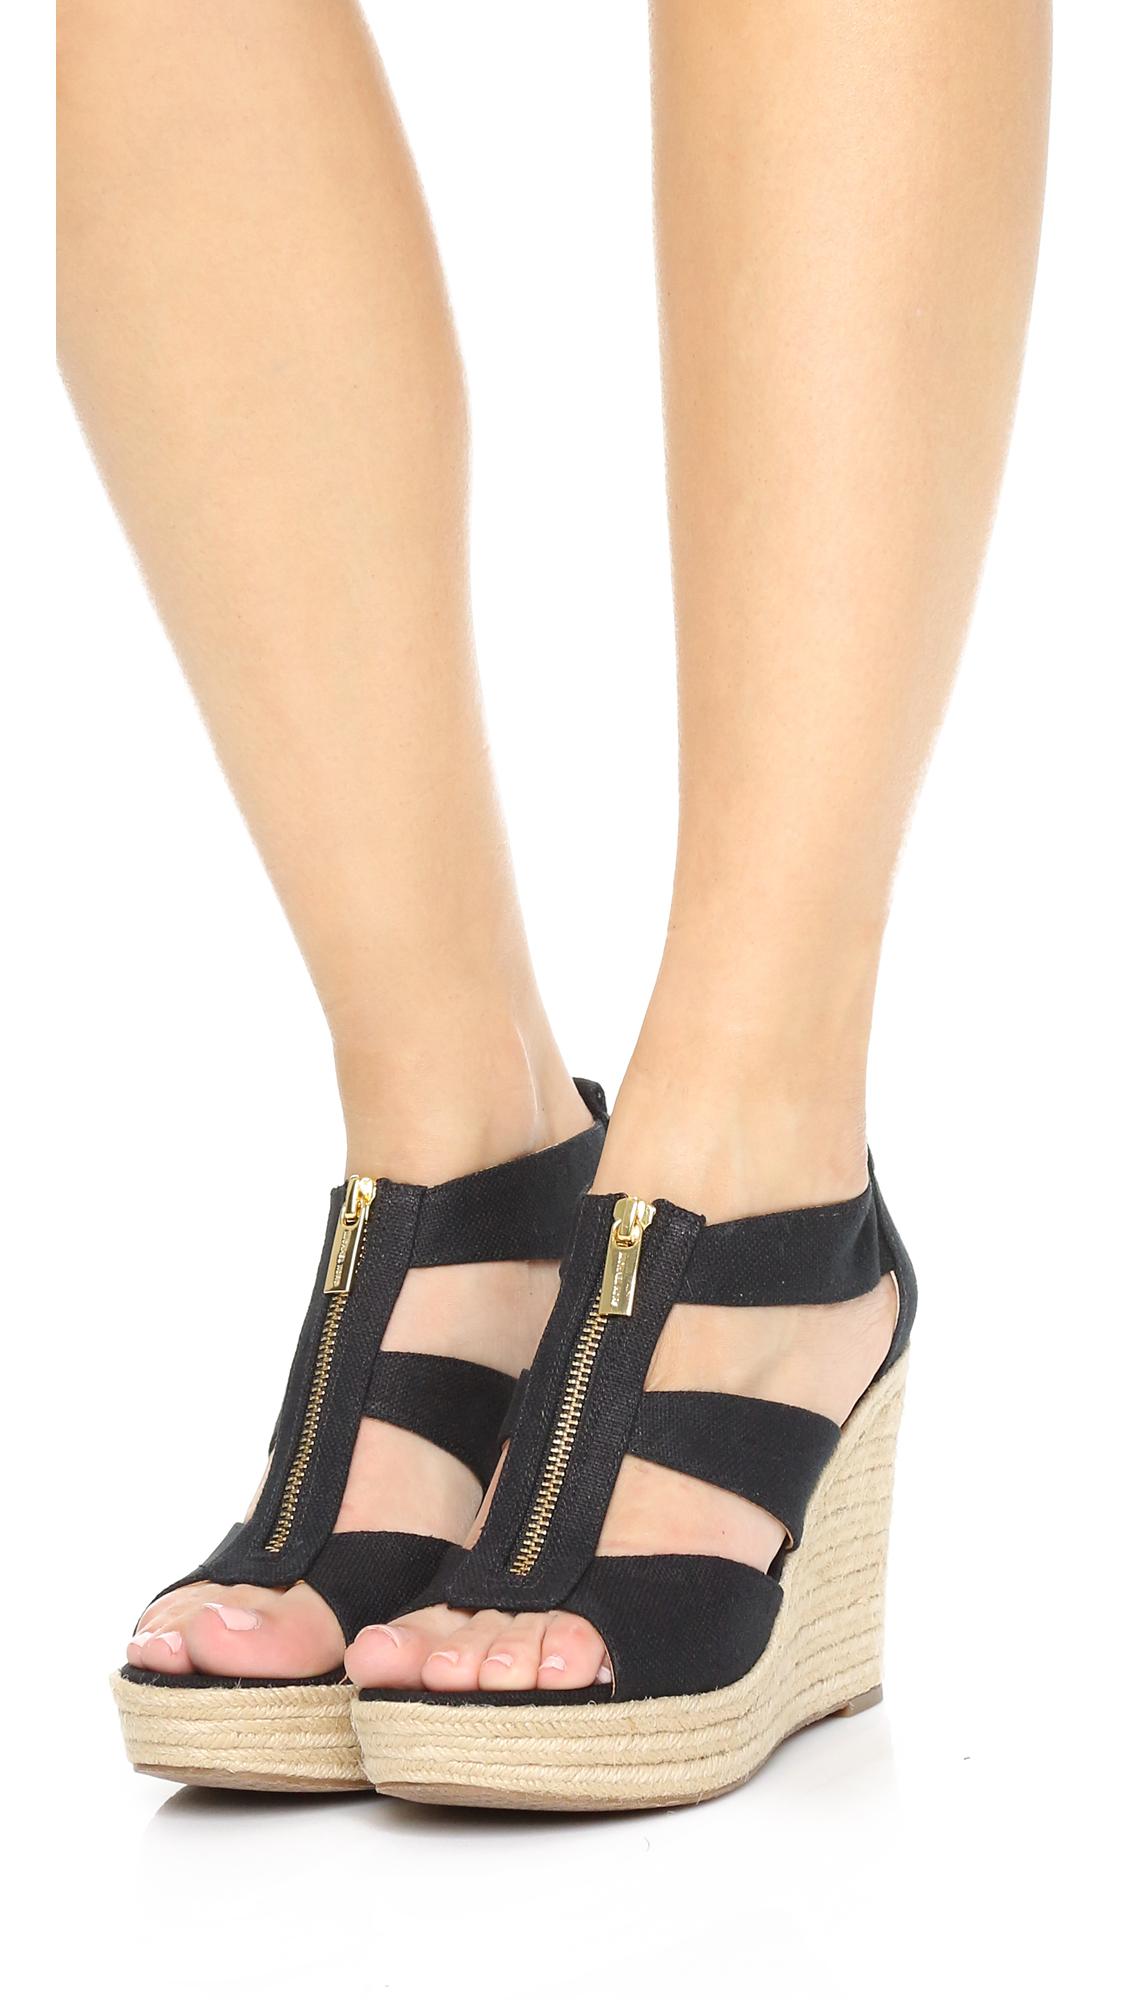 47c9bb6722c8 MICHAEL Michael Kors Damita Wedge Sandals